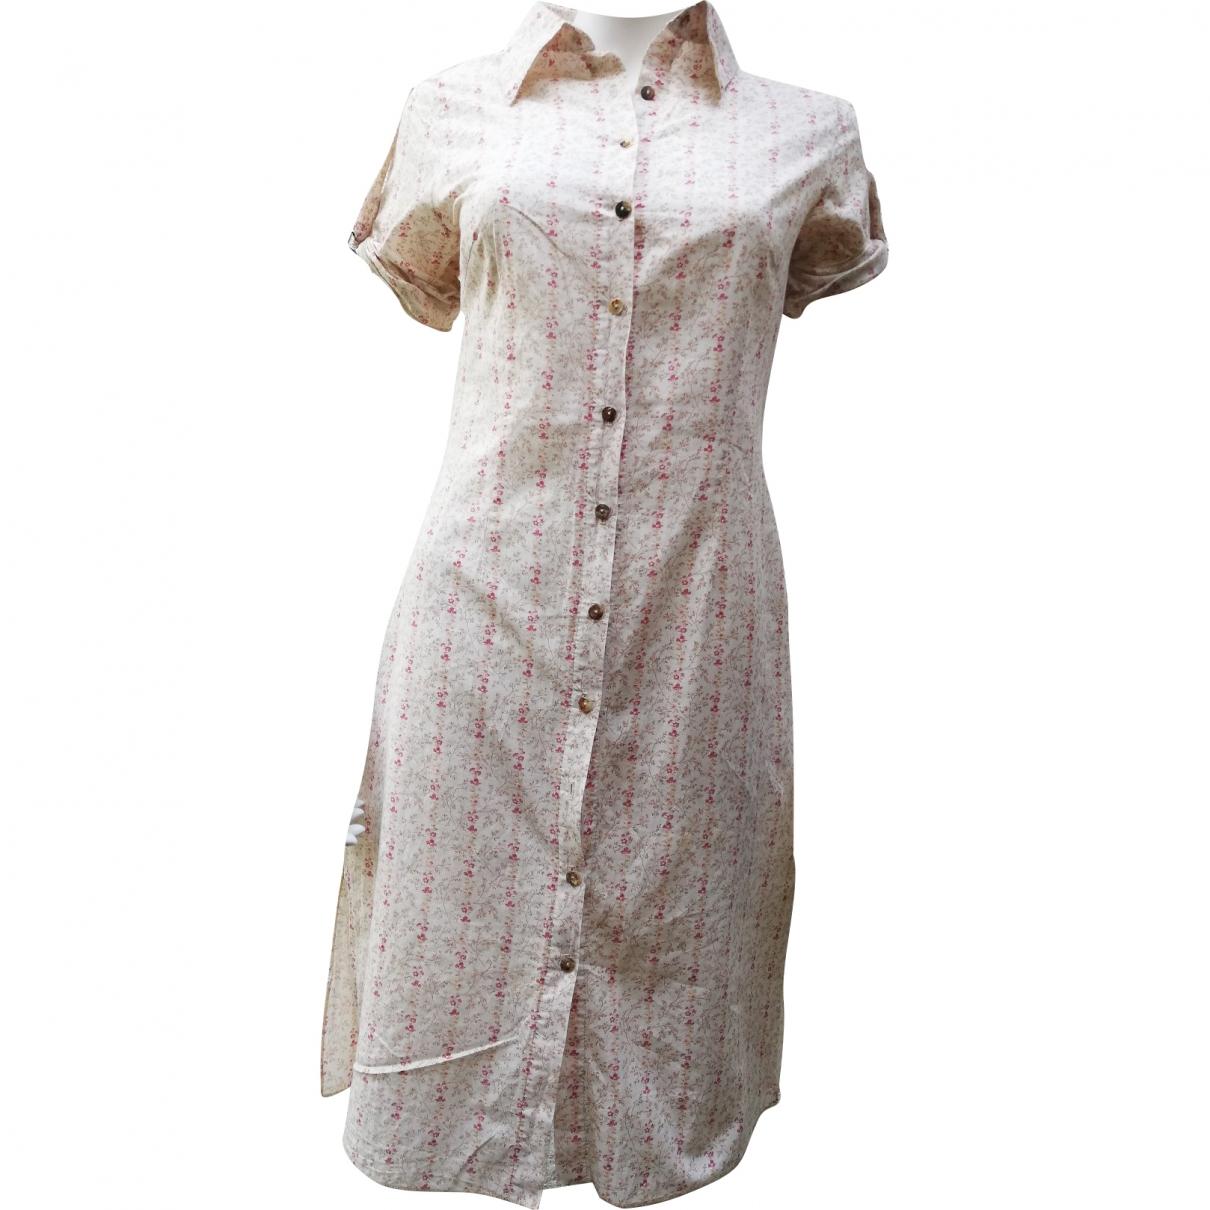 La Petite Francaise \N White Cotton dress for Women S International